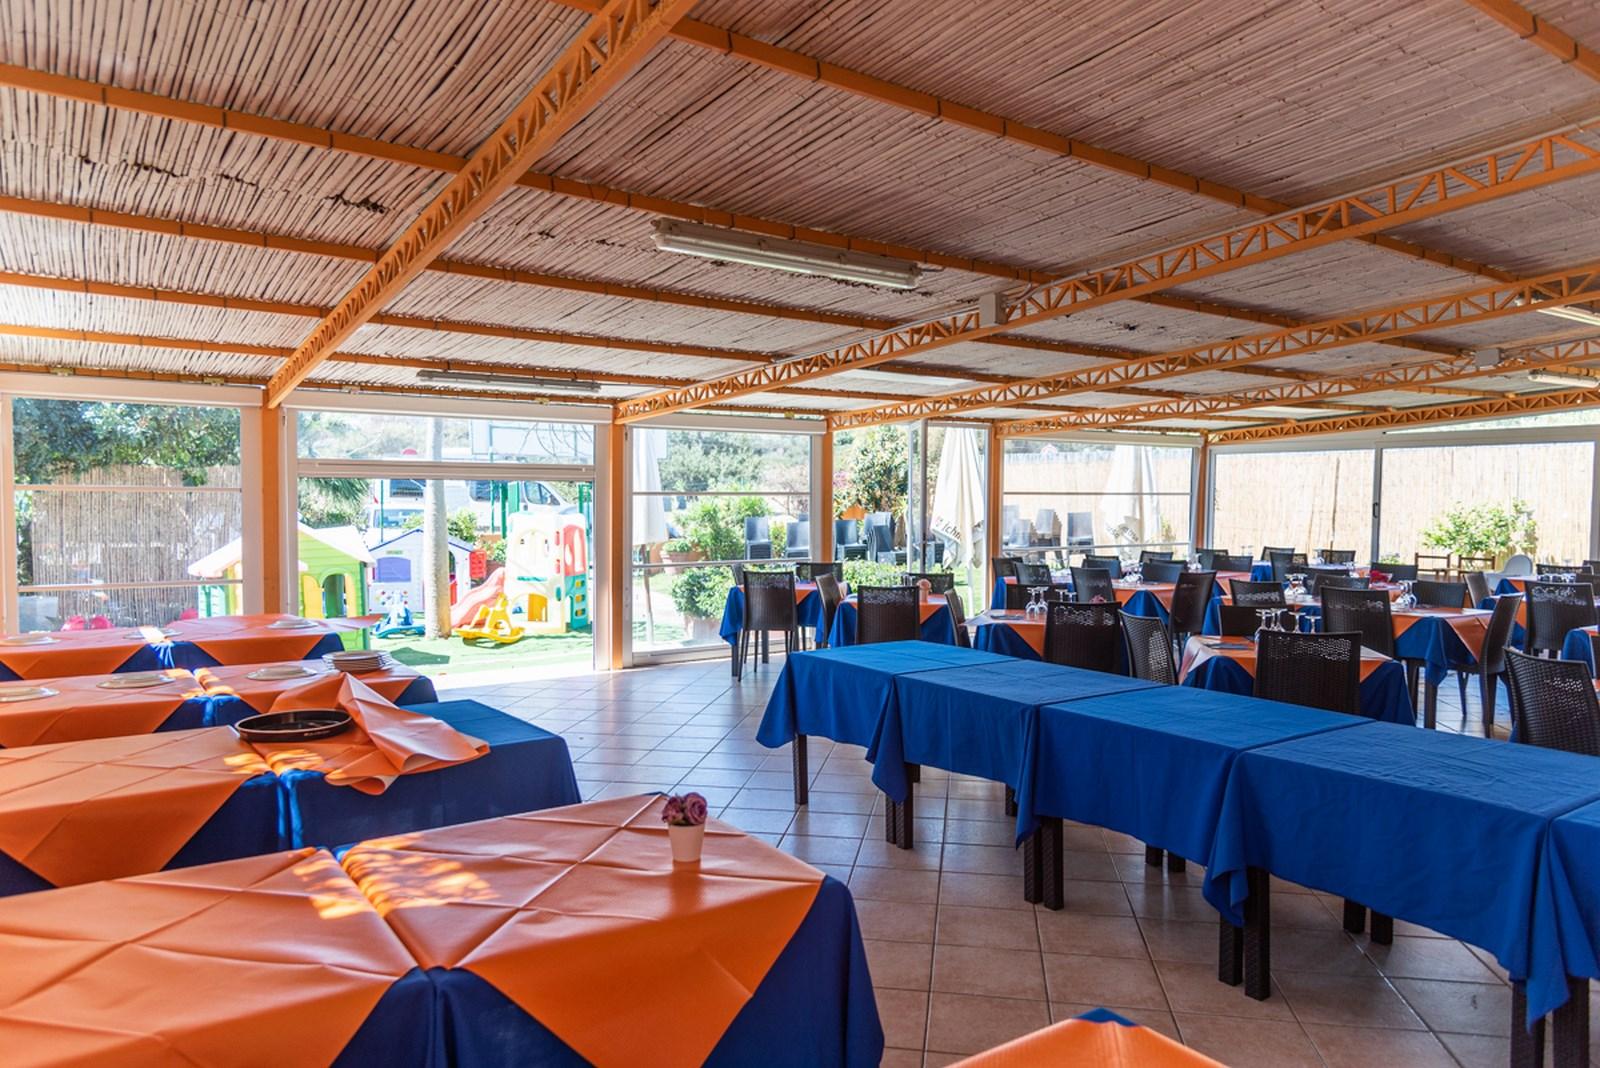 ristorante aperto a pranzo e a cena